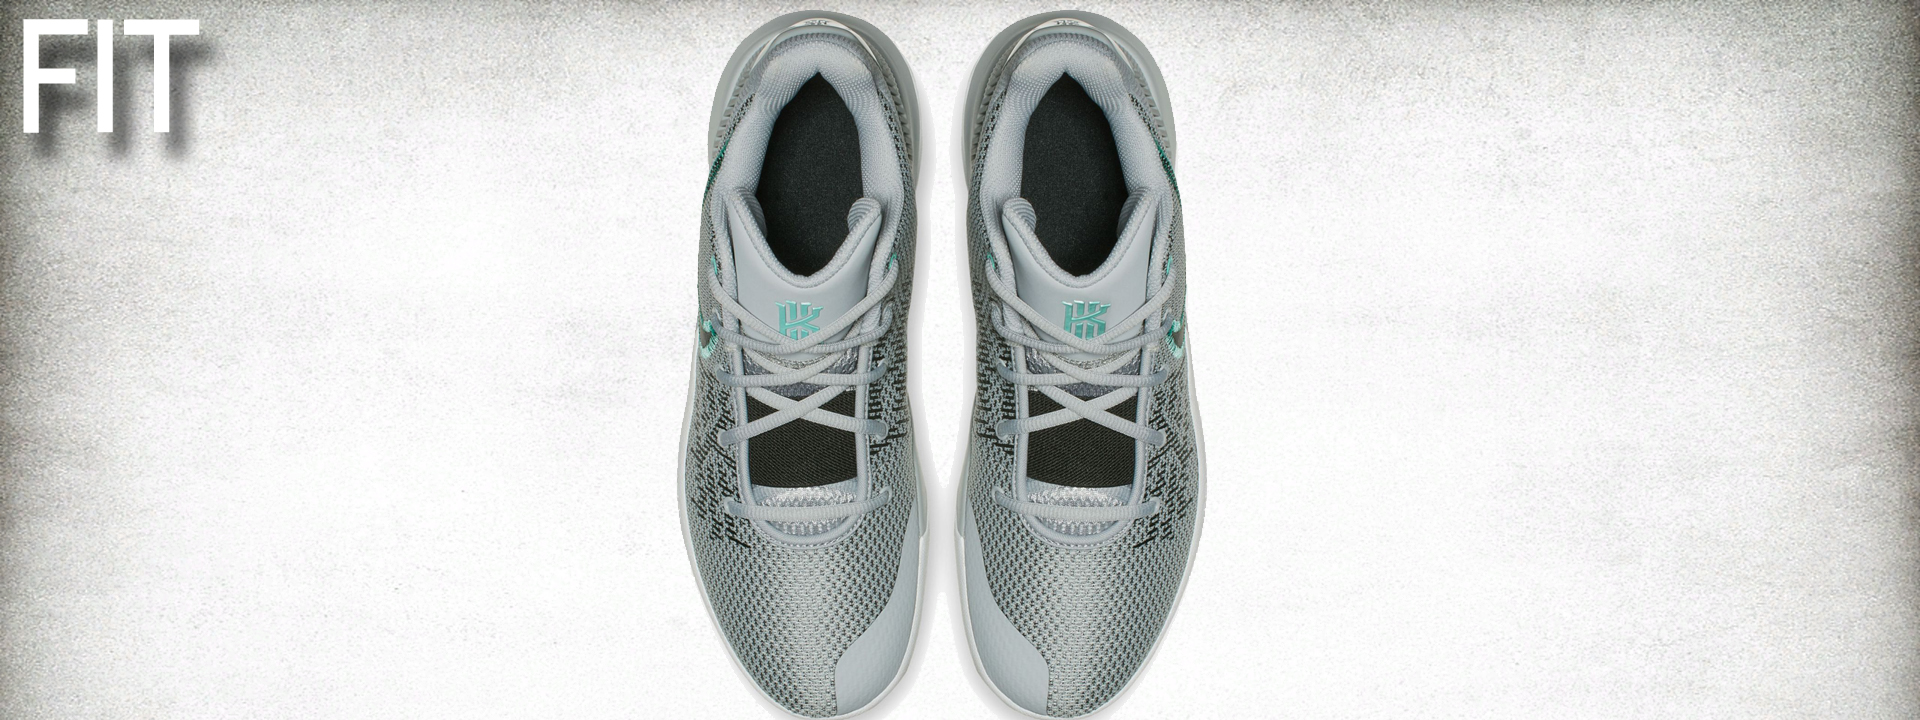 21f71e4cc2d5 Nike-Kyrie-Flytrap-2-Performance-Review-Fit - WearTesters